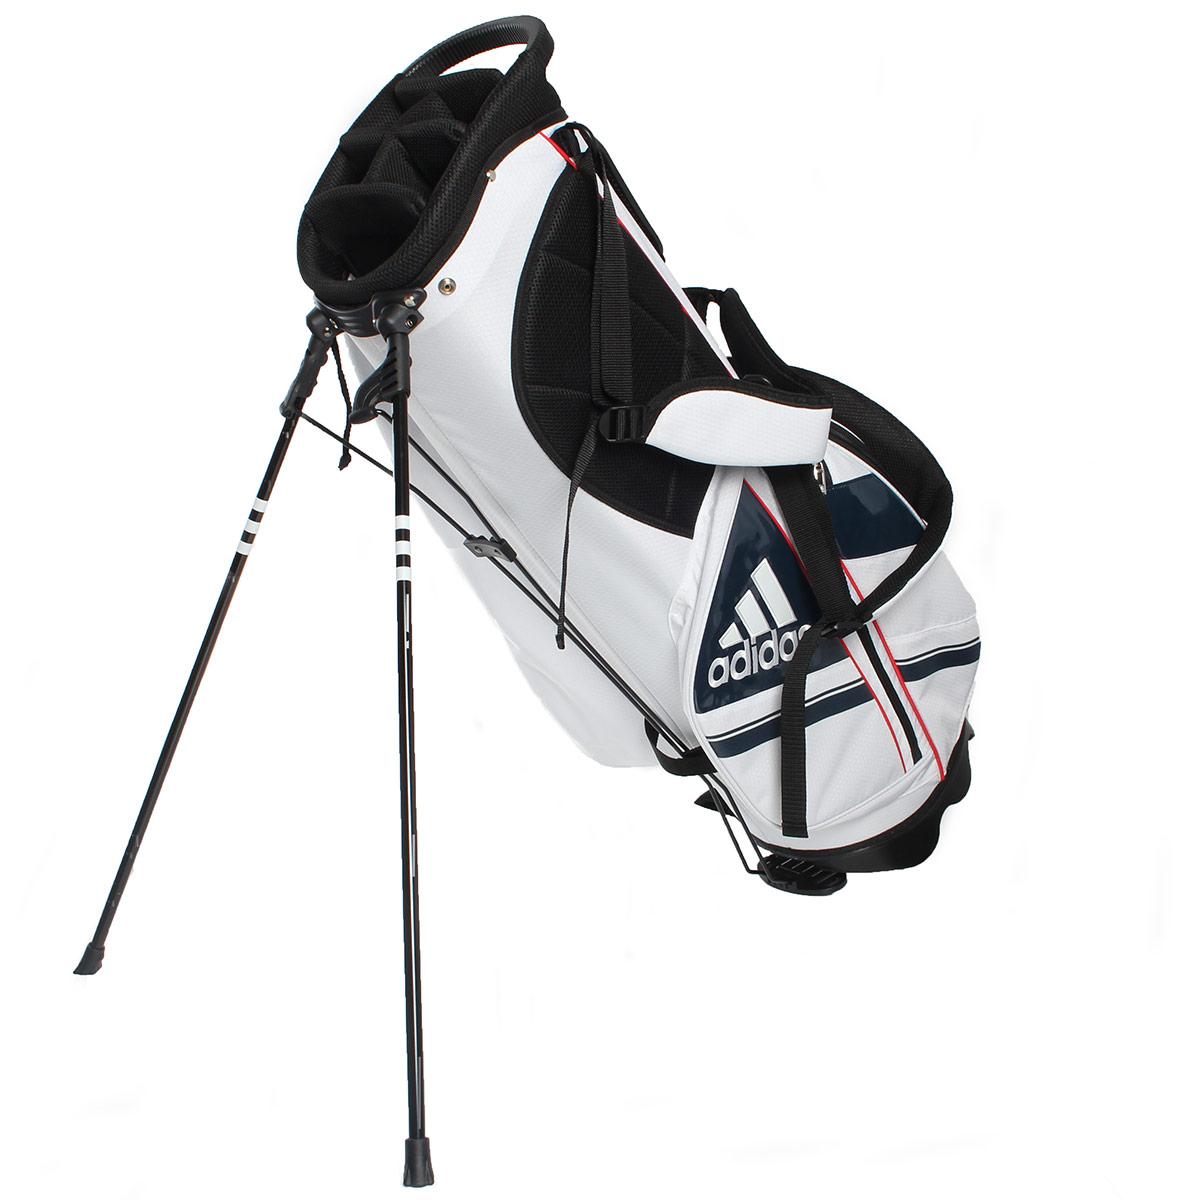 20e706f634 ... Adidas AWU39 Stand Bag ...